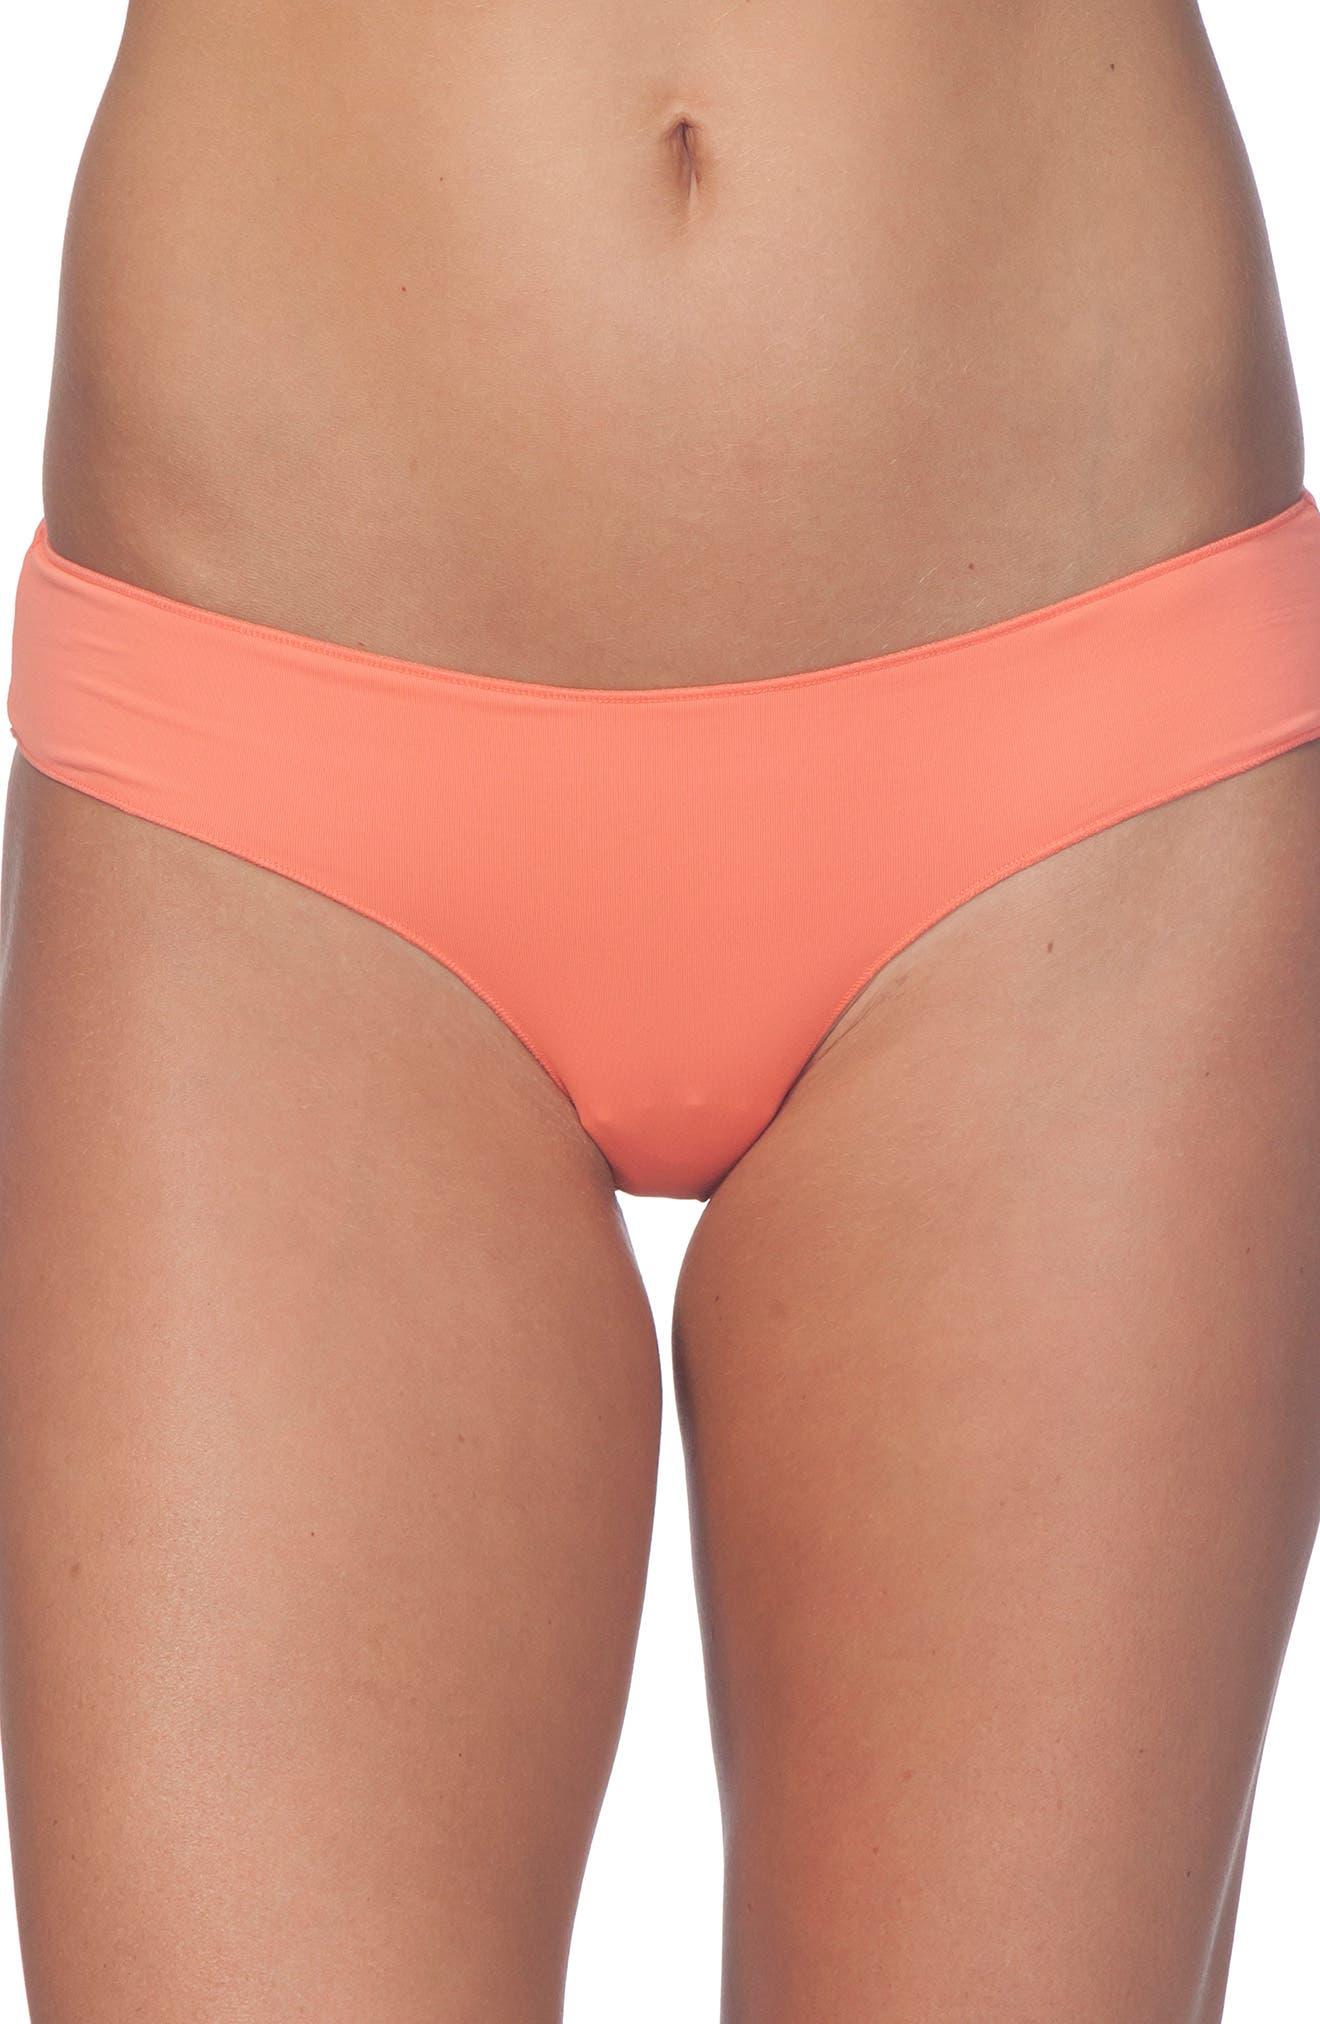 Classic Surf Hipster Bikini Bottom,                             Main thumbnail 1, color,                             Coral